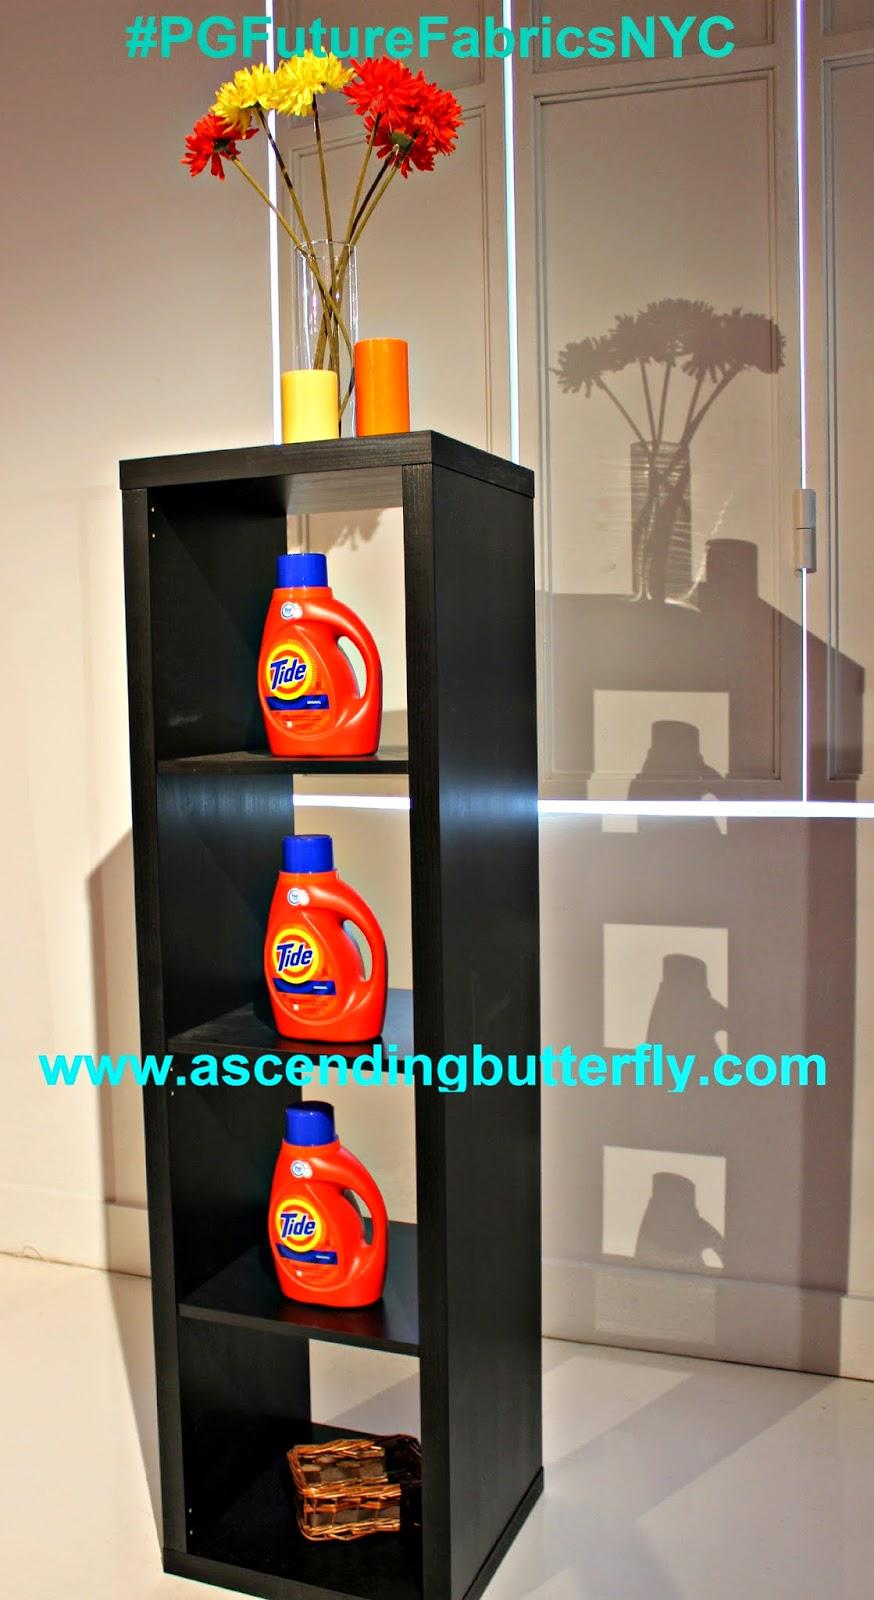 Display of Tide Products #PGFutureFabricsNYC